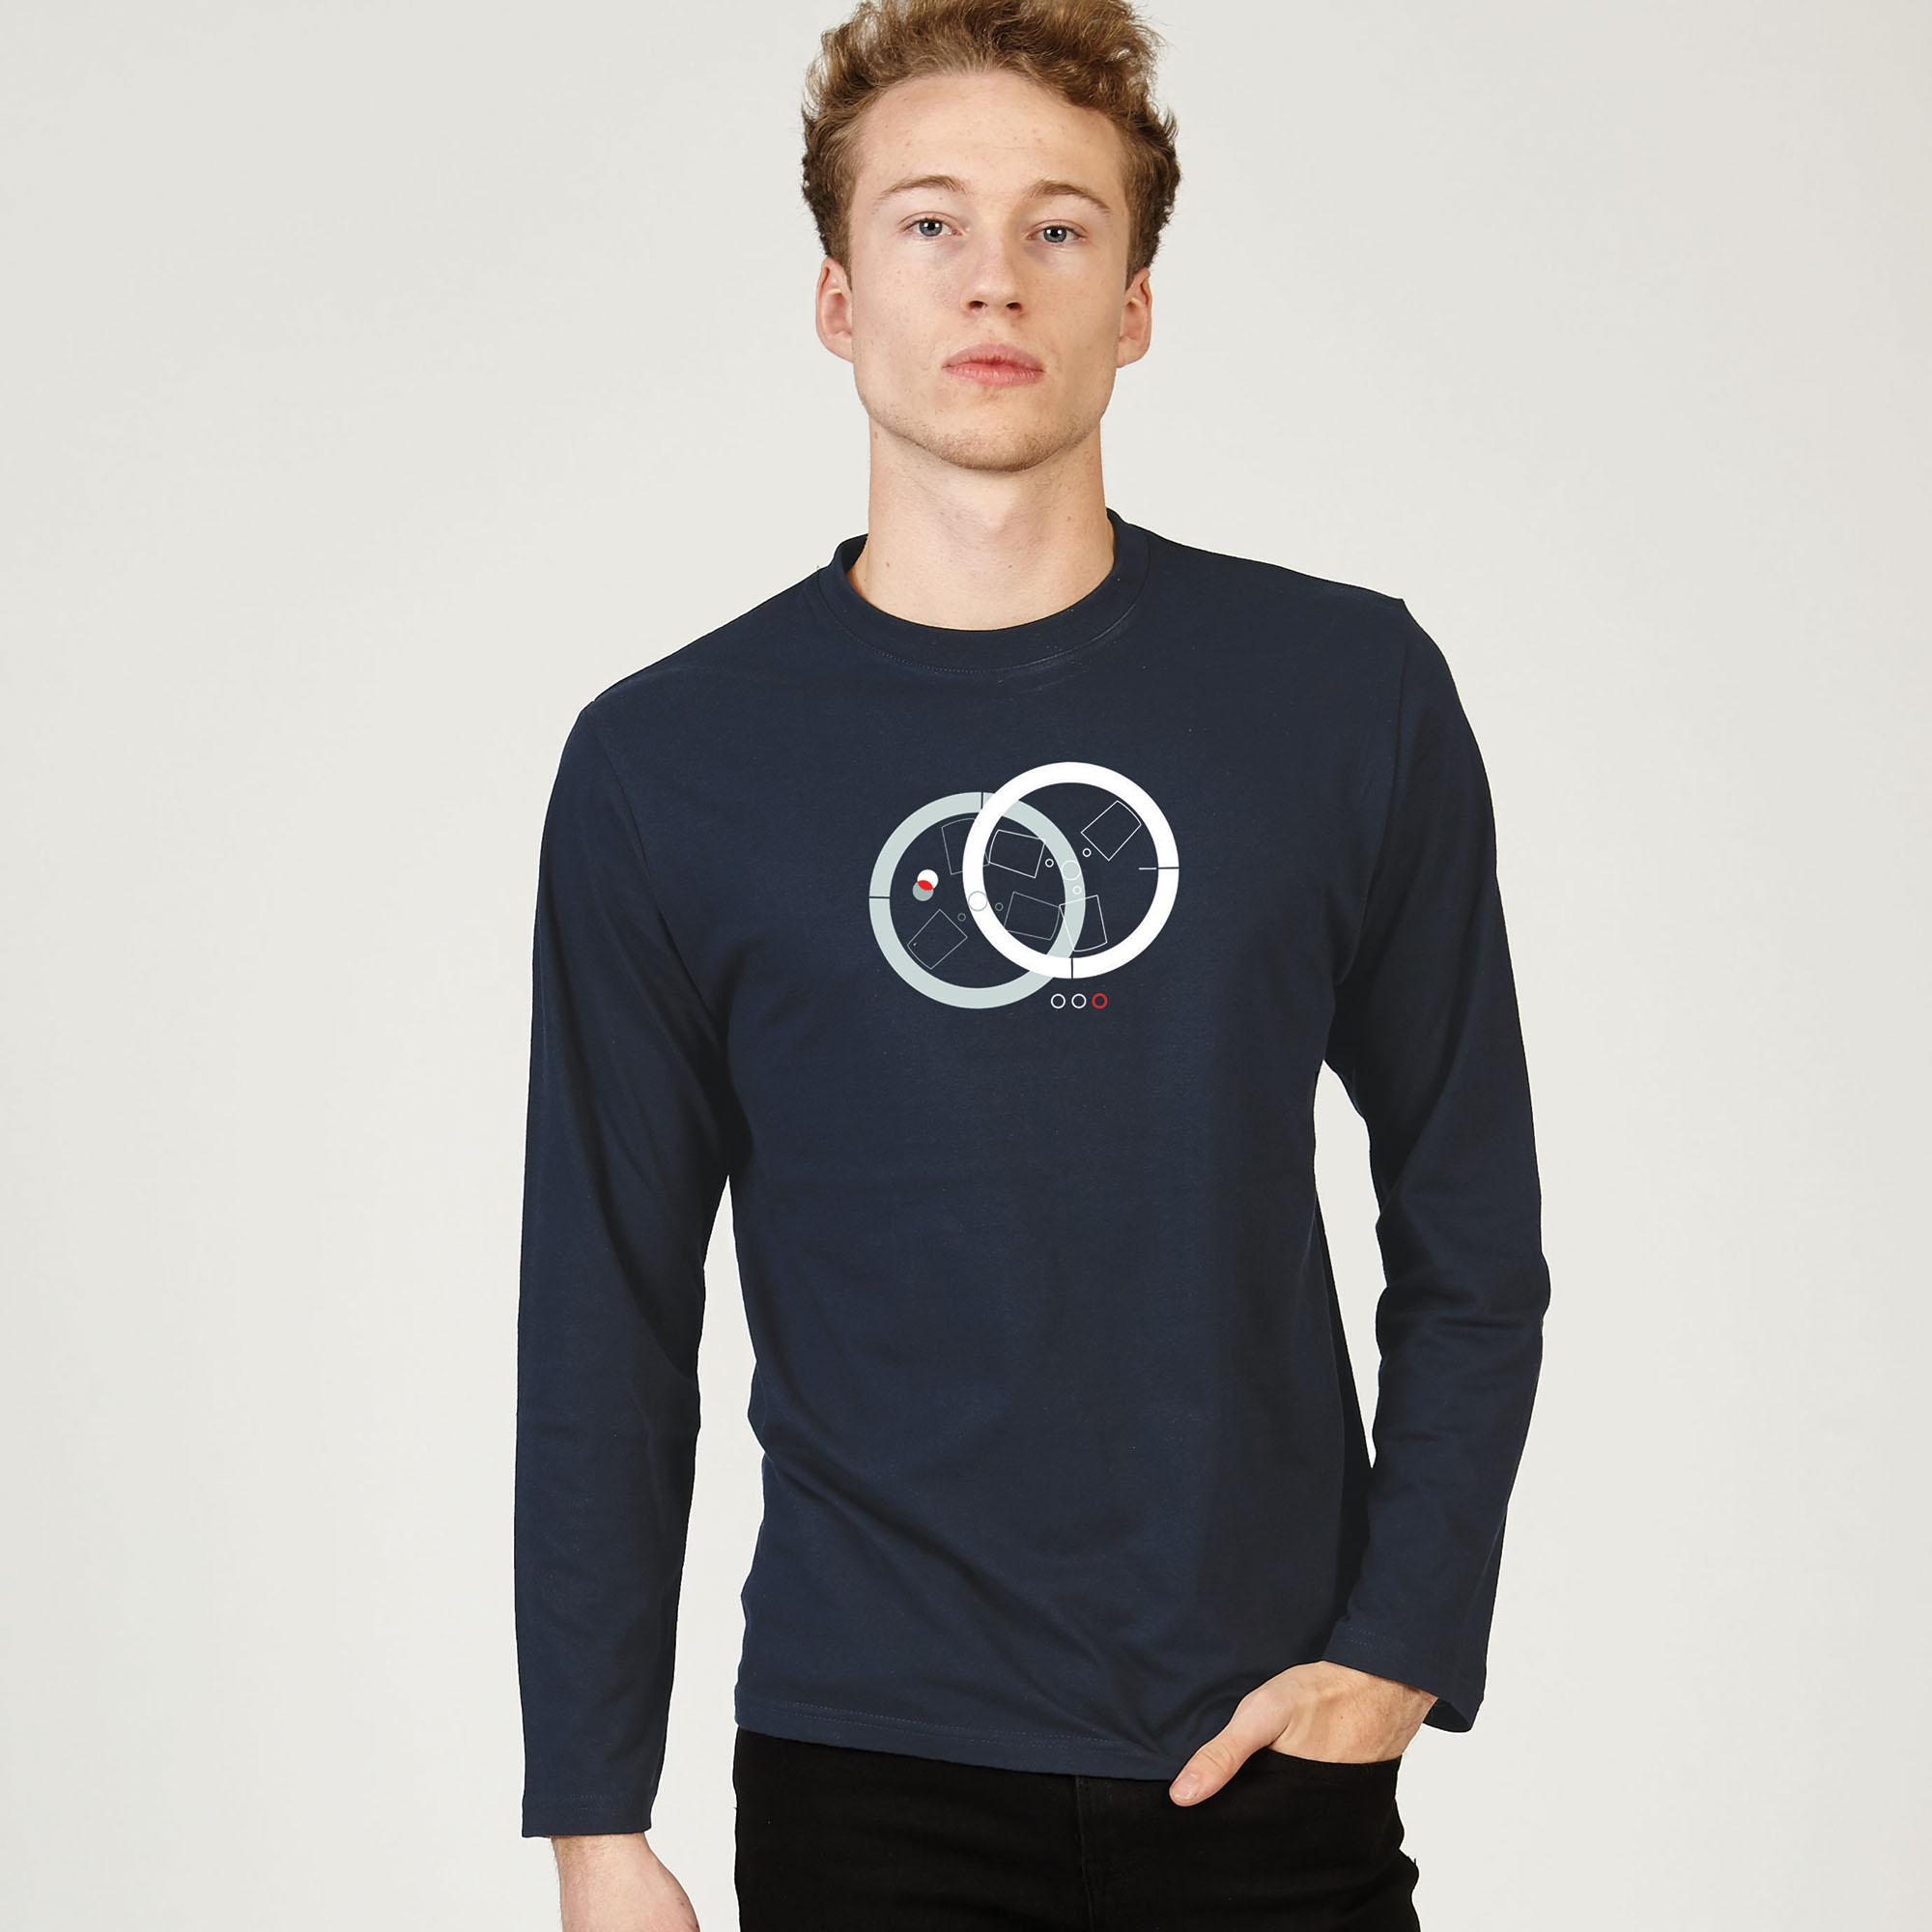 T-Lab-Open-Reel-mens-longsleeve-t-shirt-navy